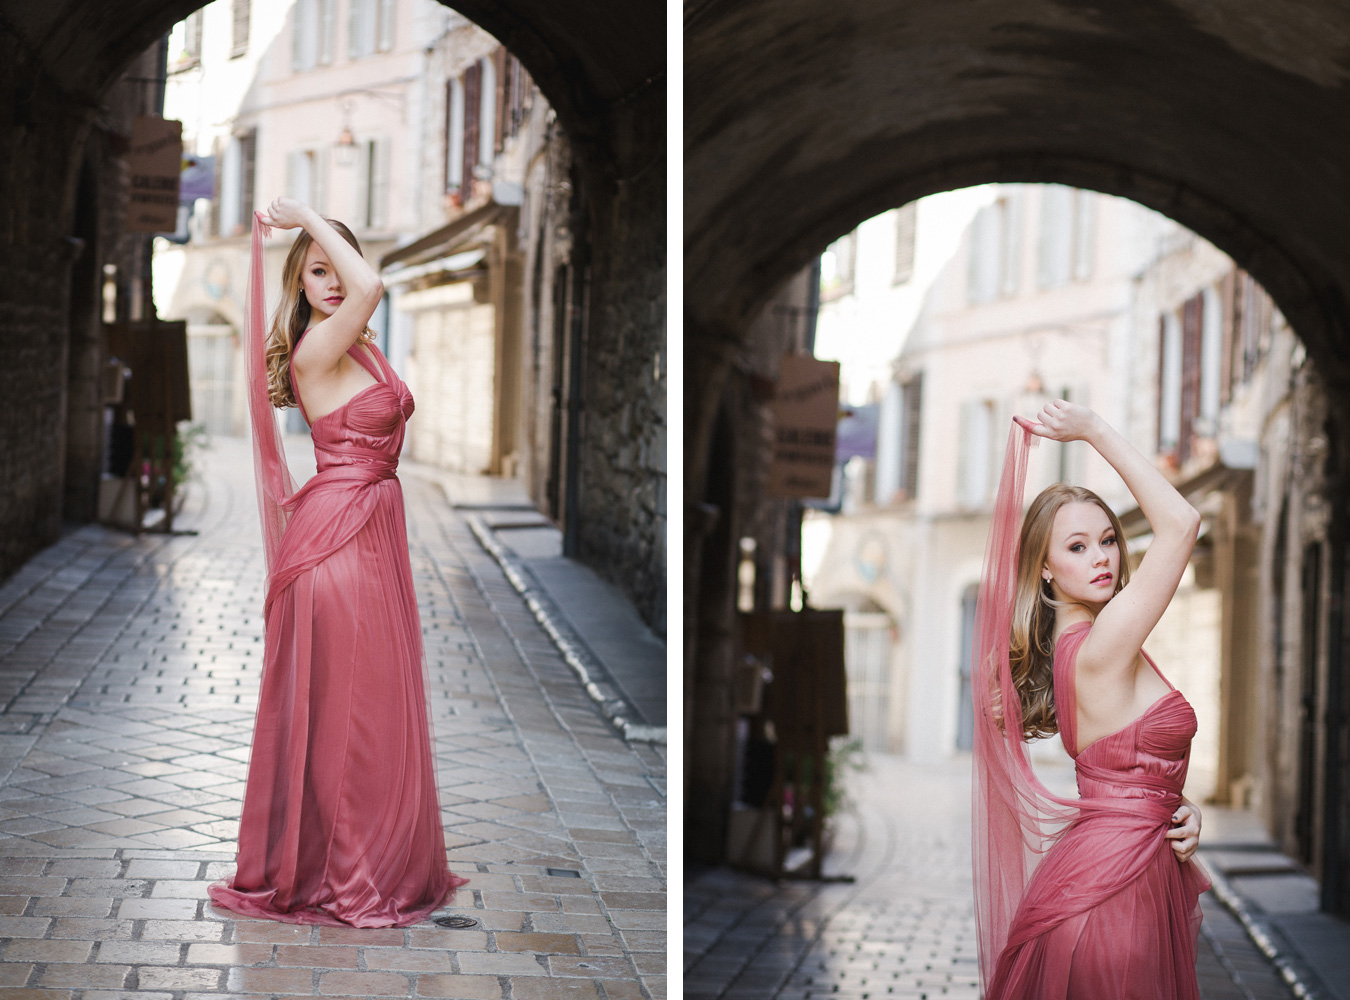 002-fotograf-tone-tvedt-bryllup-i-utlandet.jpg